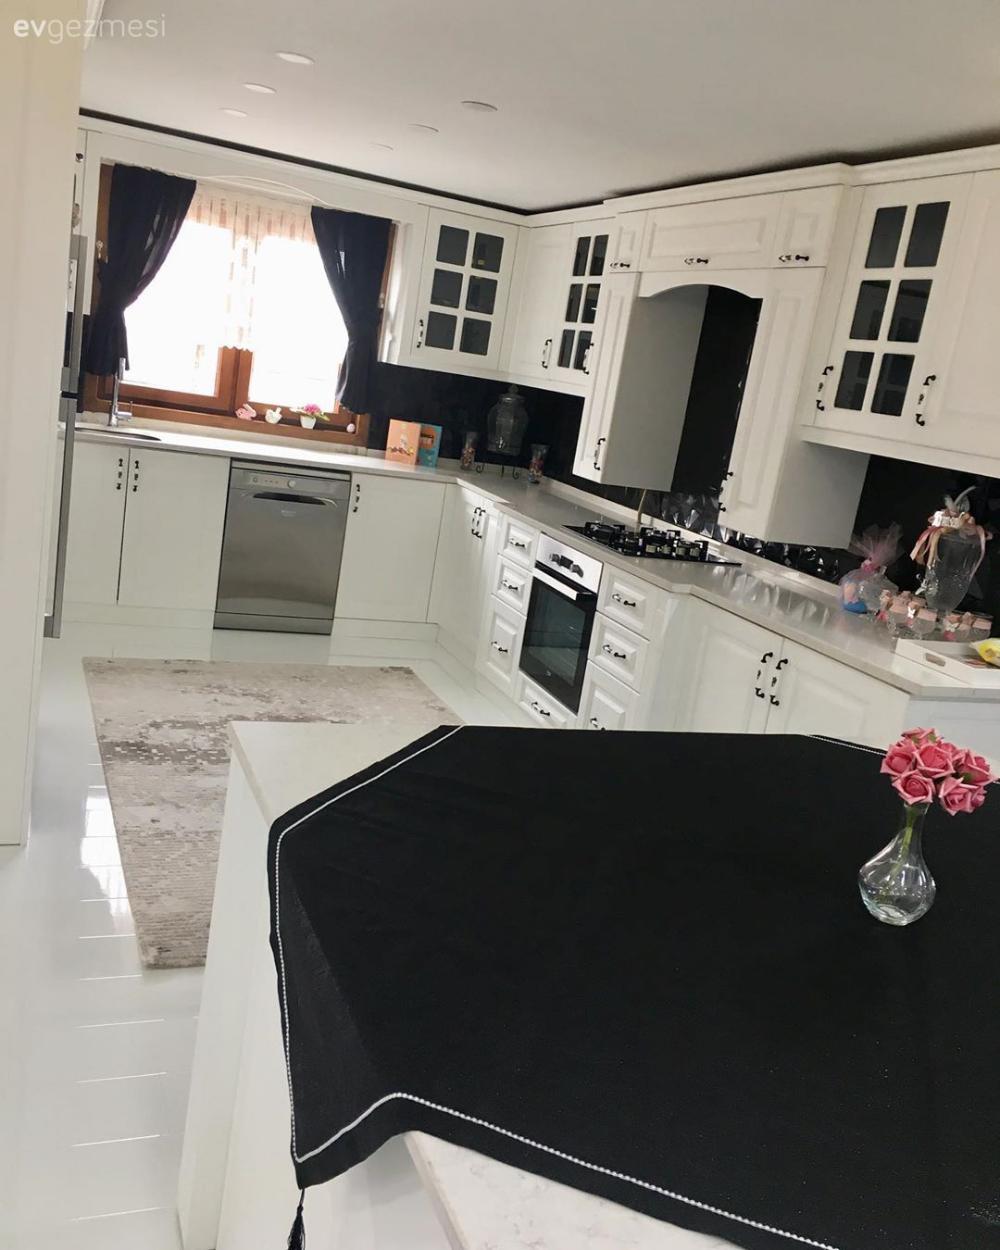 Ev Gezmesi Beyazla Siyahi Bulusturan Sik Bir Mutfak Ev Gezmesi Beyazla Bir Bulusturan In 2020 Stylish Kitchen White Kitchen Kitchen Countertop Decor